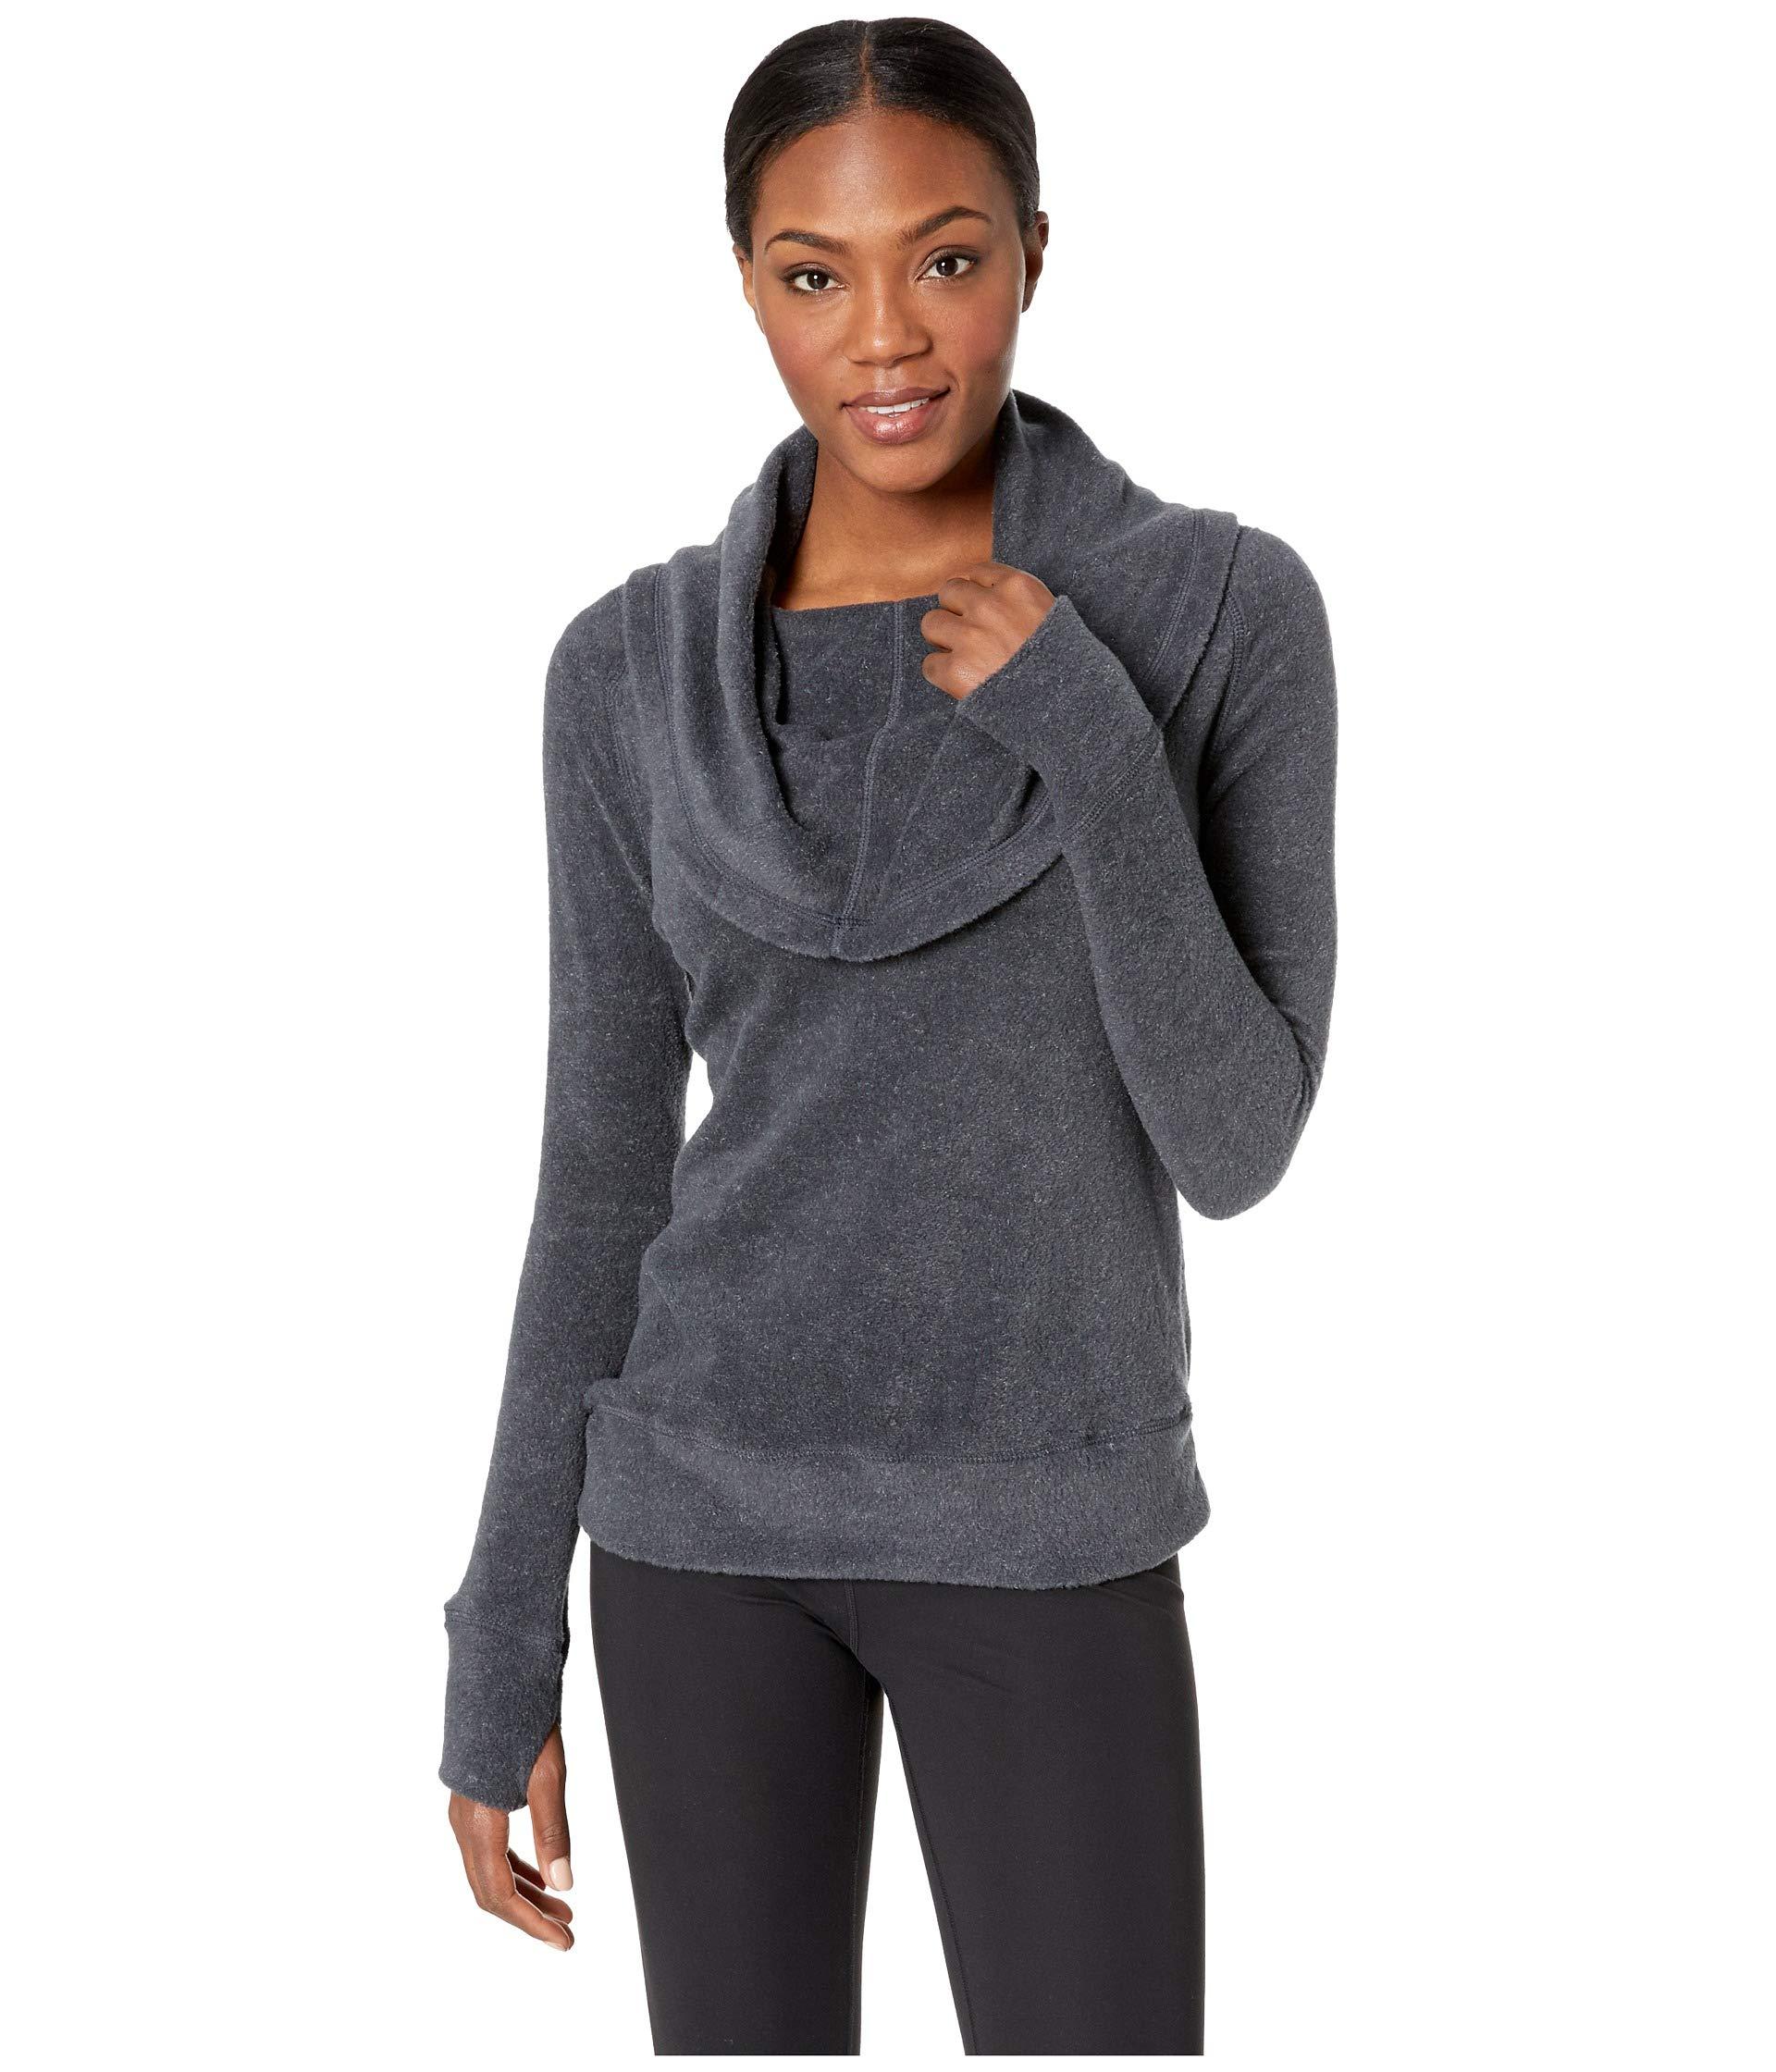 Cowl Kenosha Navy Sweatshirt Designs Stonewear qPnW5Ex